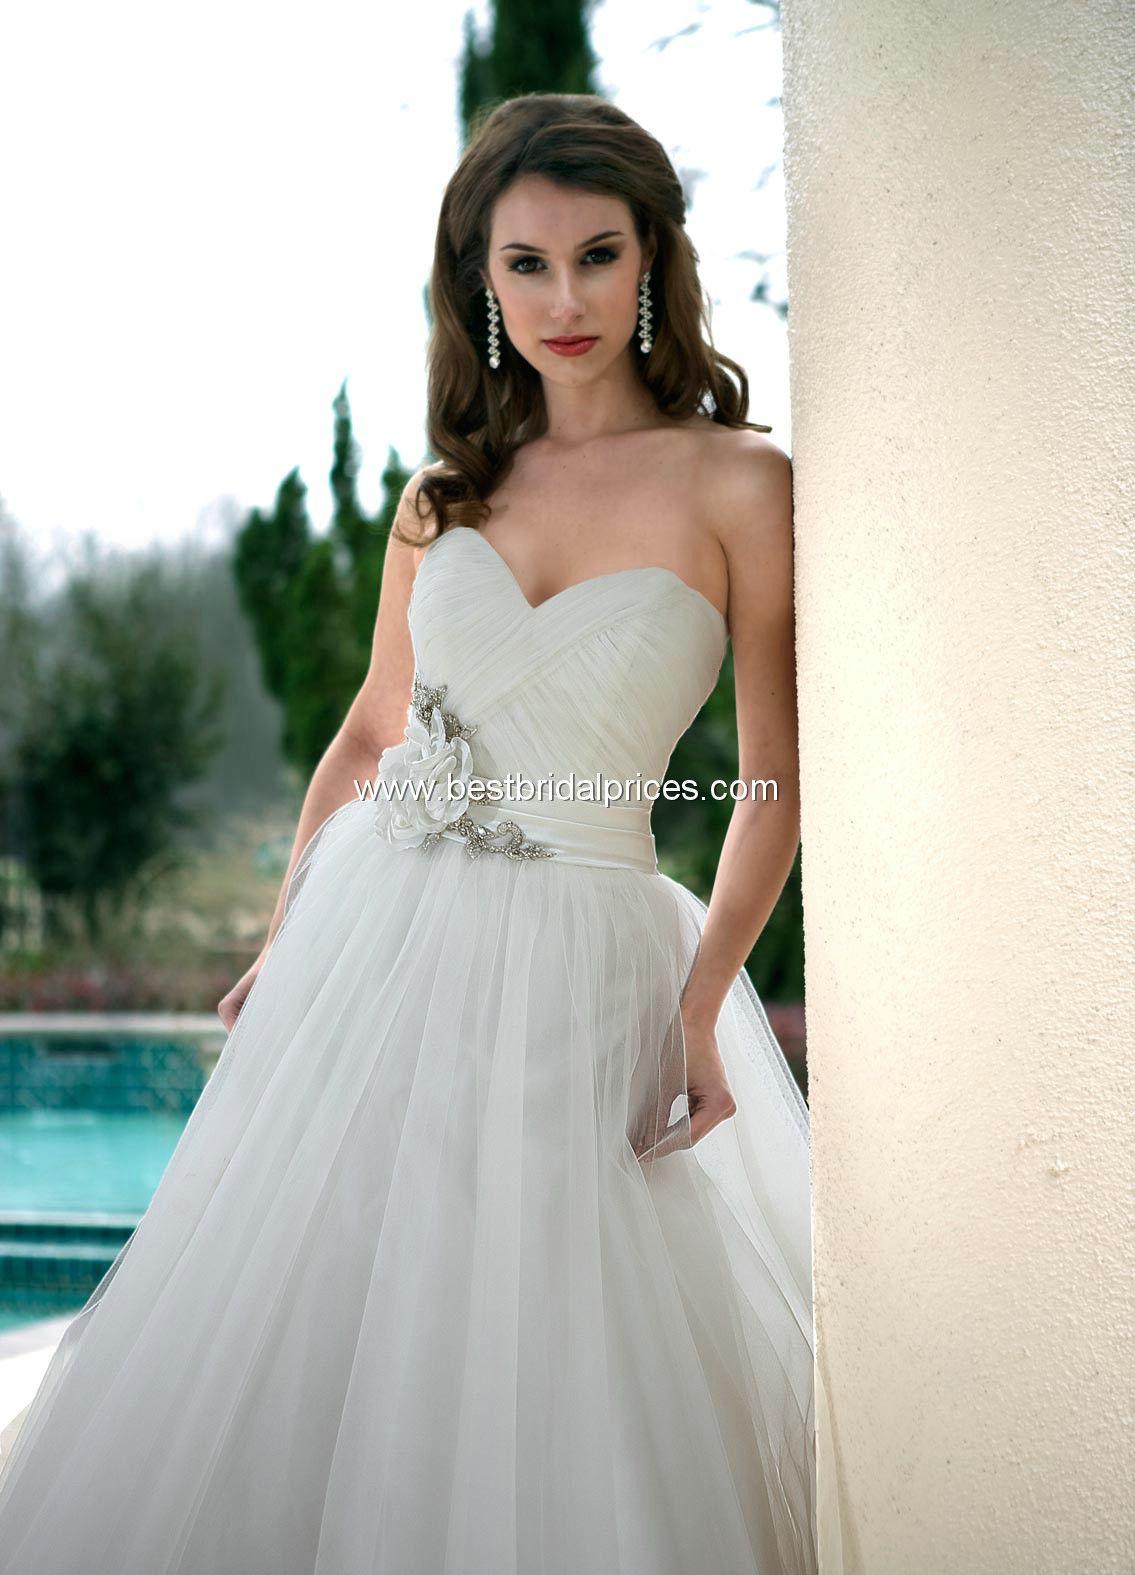 Davinci wedding dresses style i wore this beautiful dress